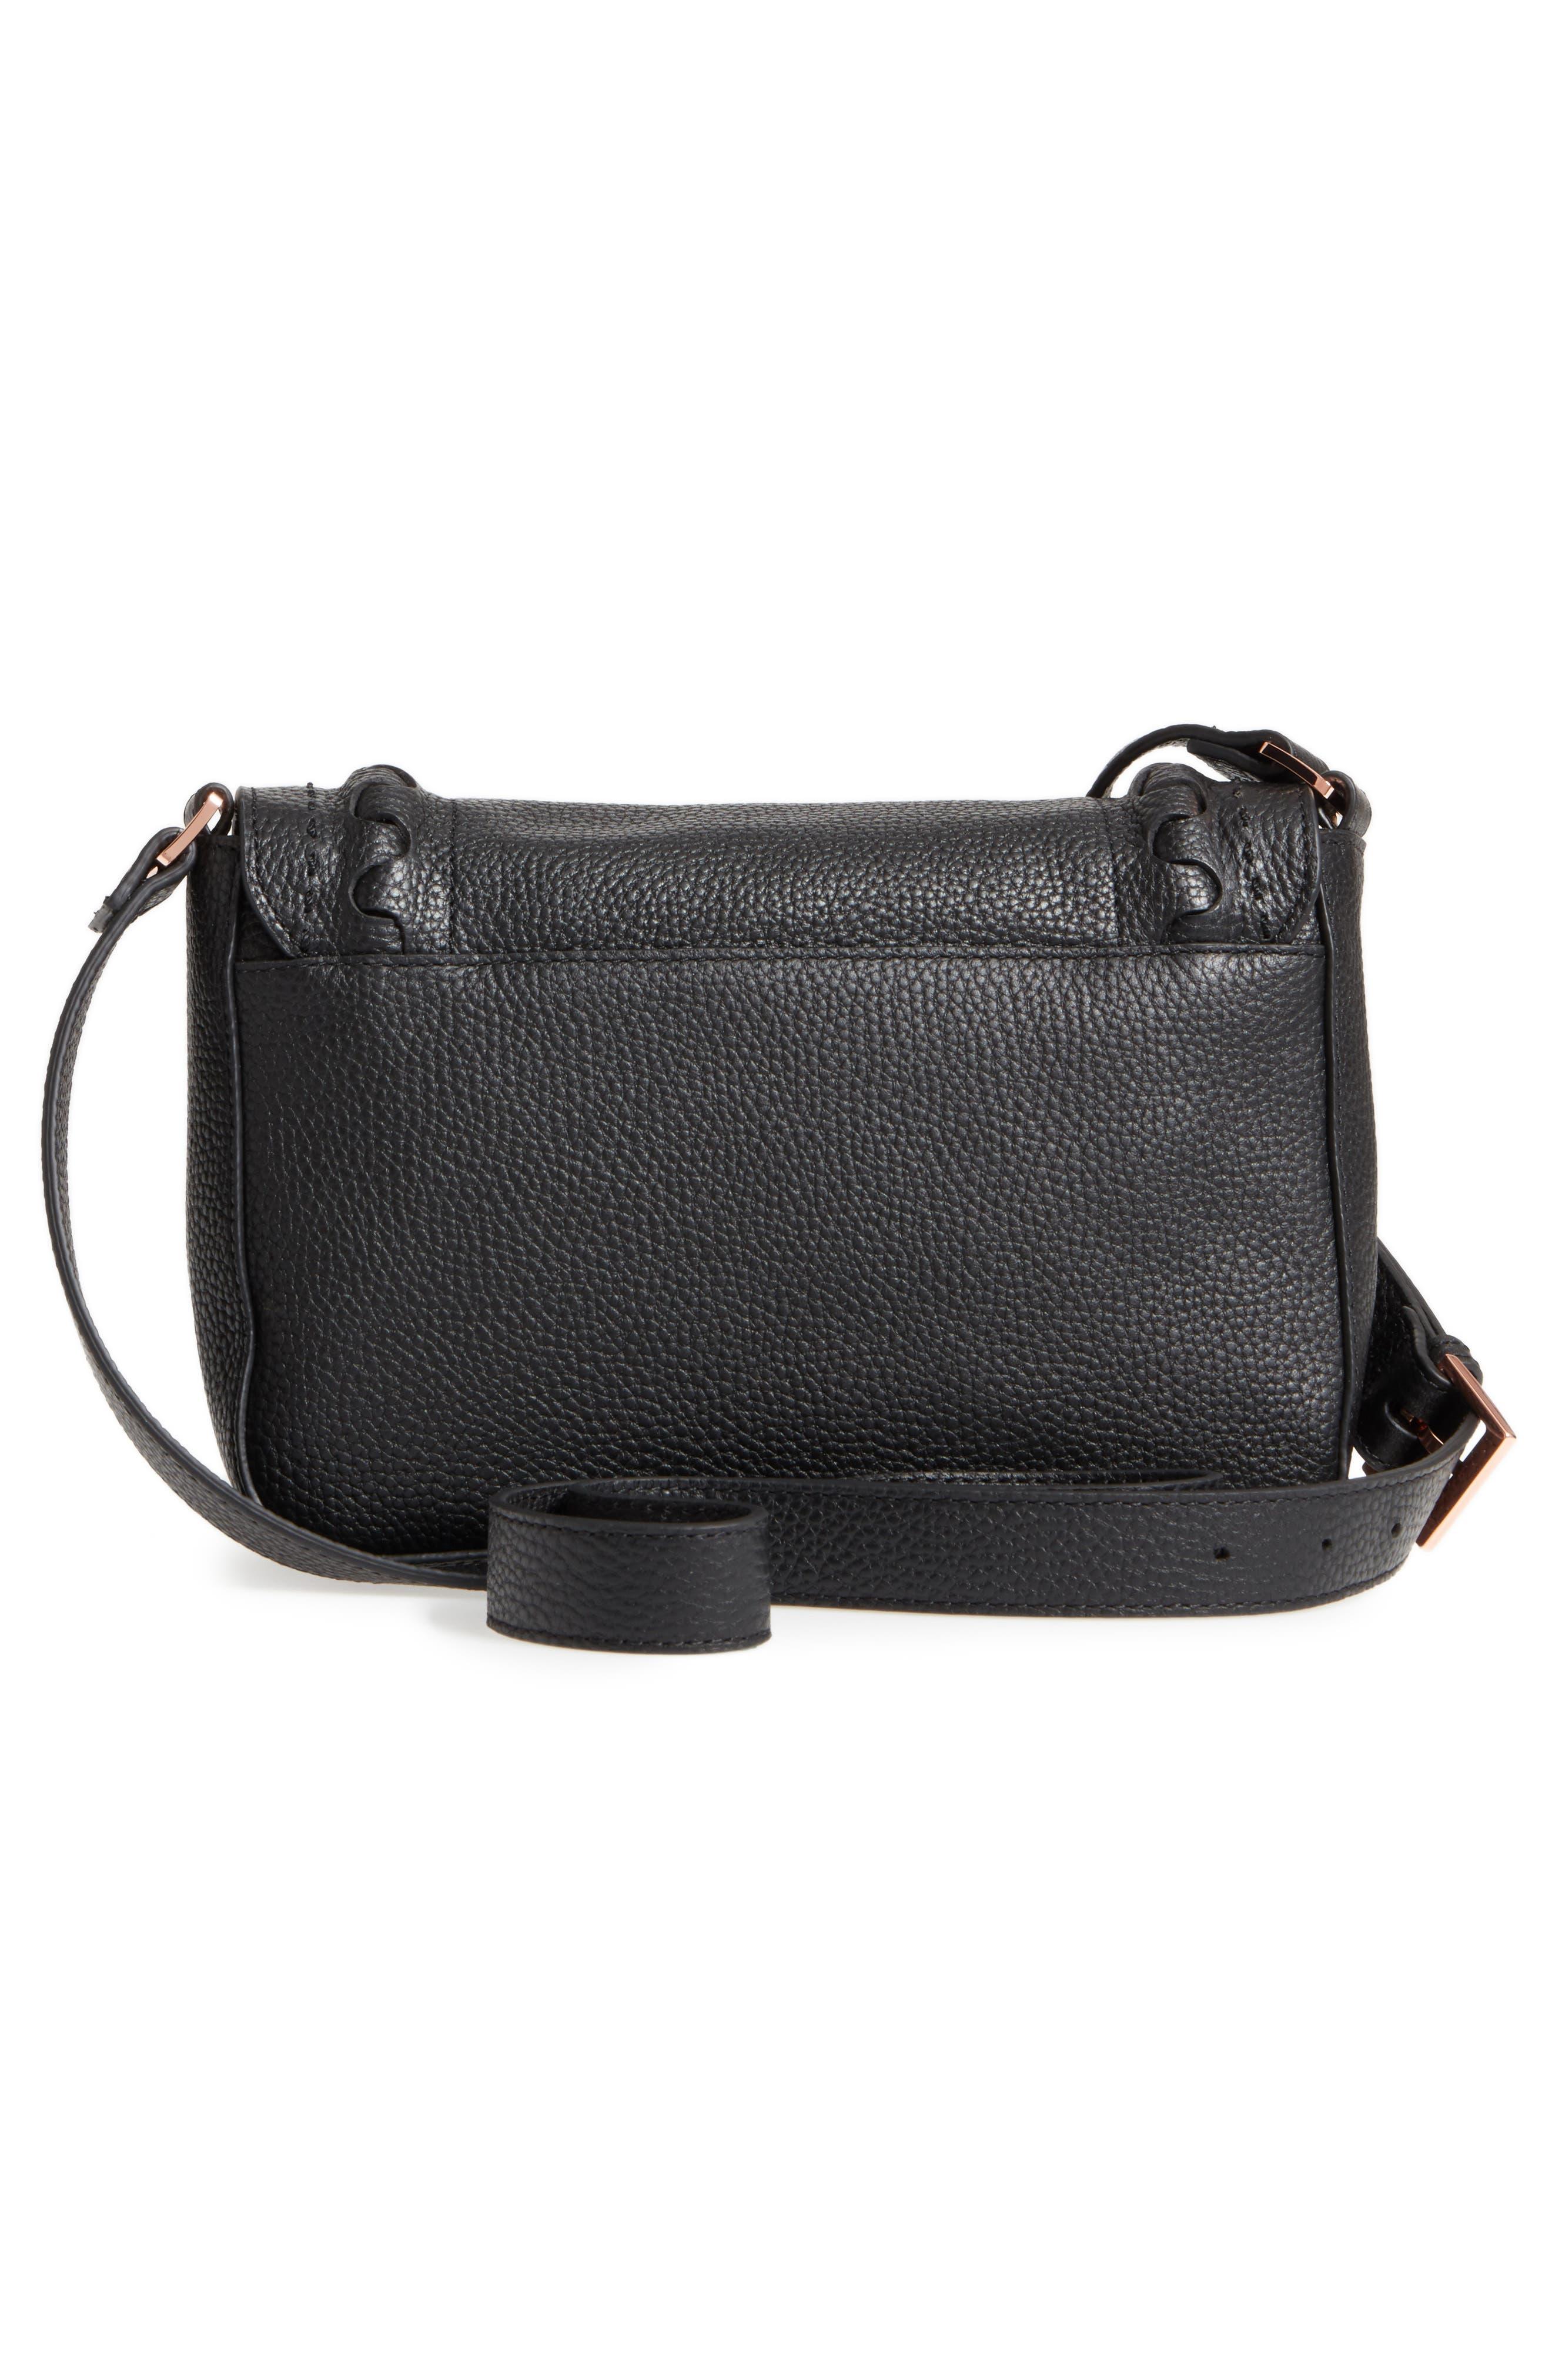 Tippi Leather Crossbody Bag,                             Alternate thumbnail 7, color,